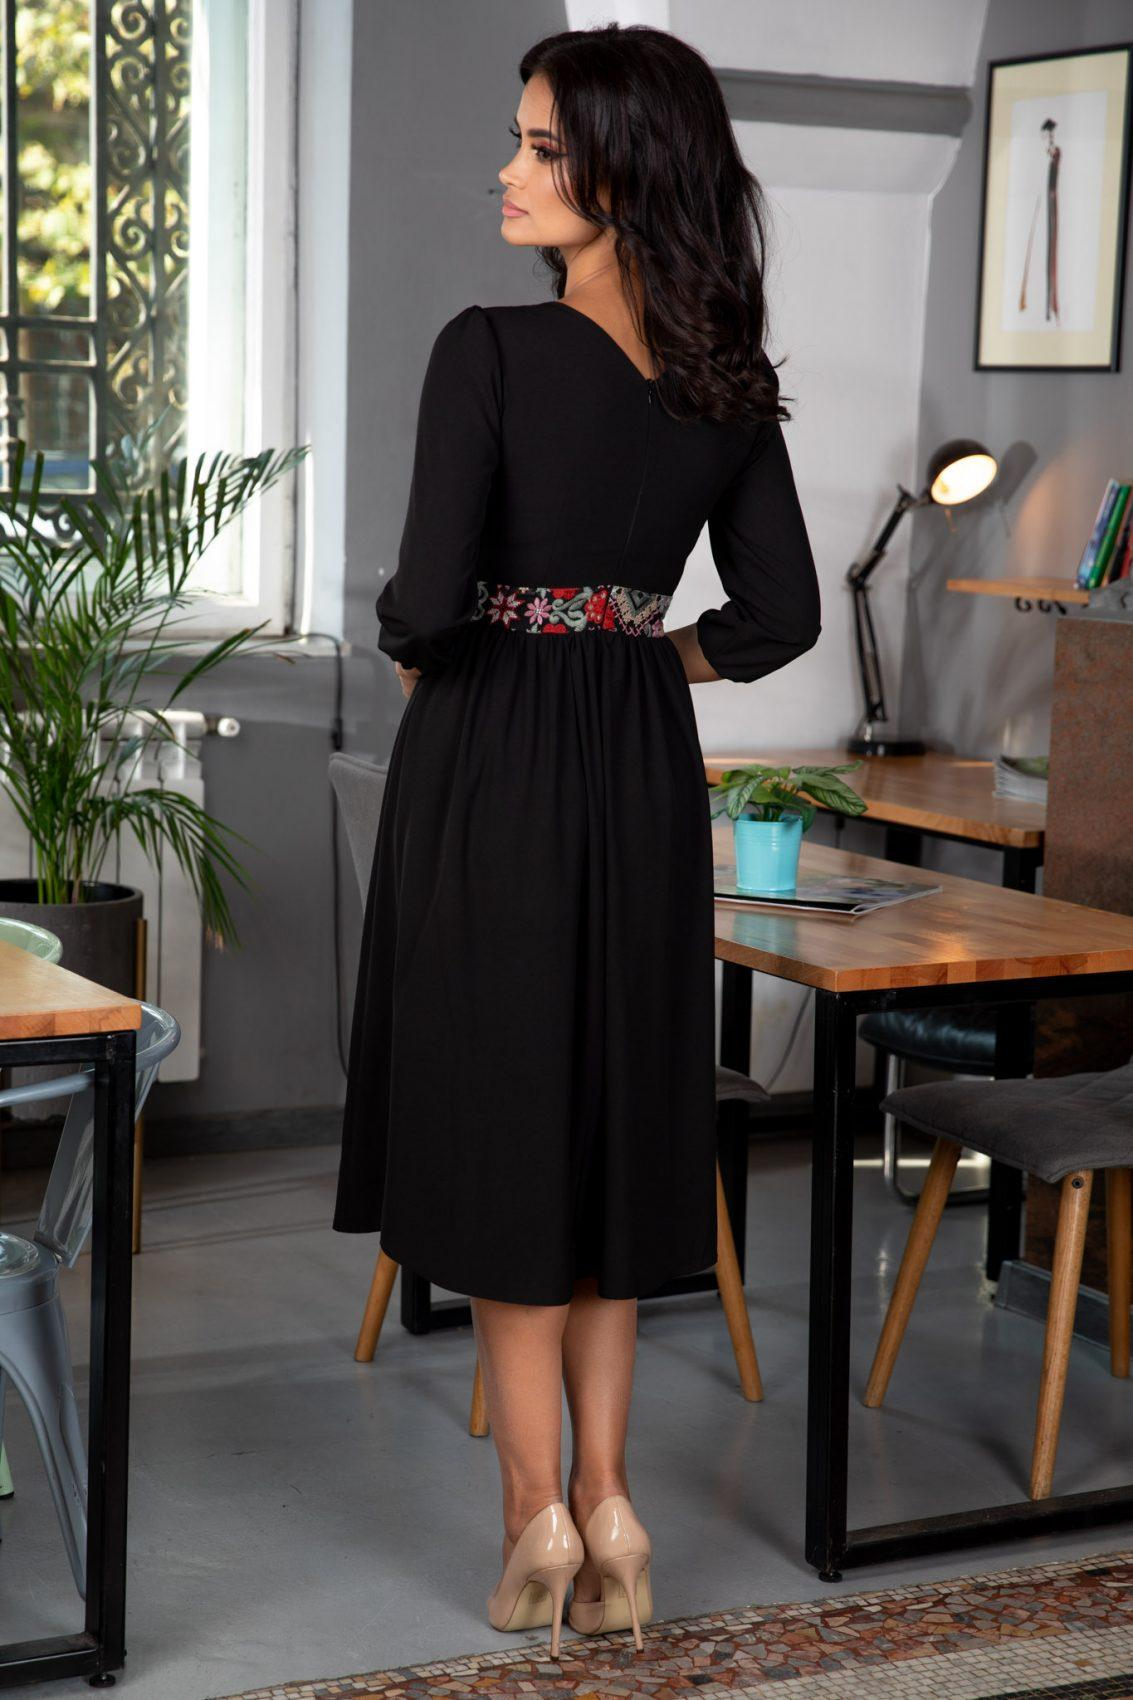 Moze Jilian Μαύρο Φόρεμα 5379